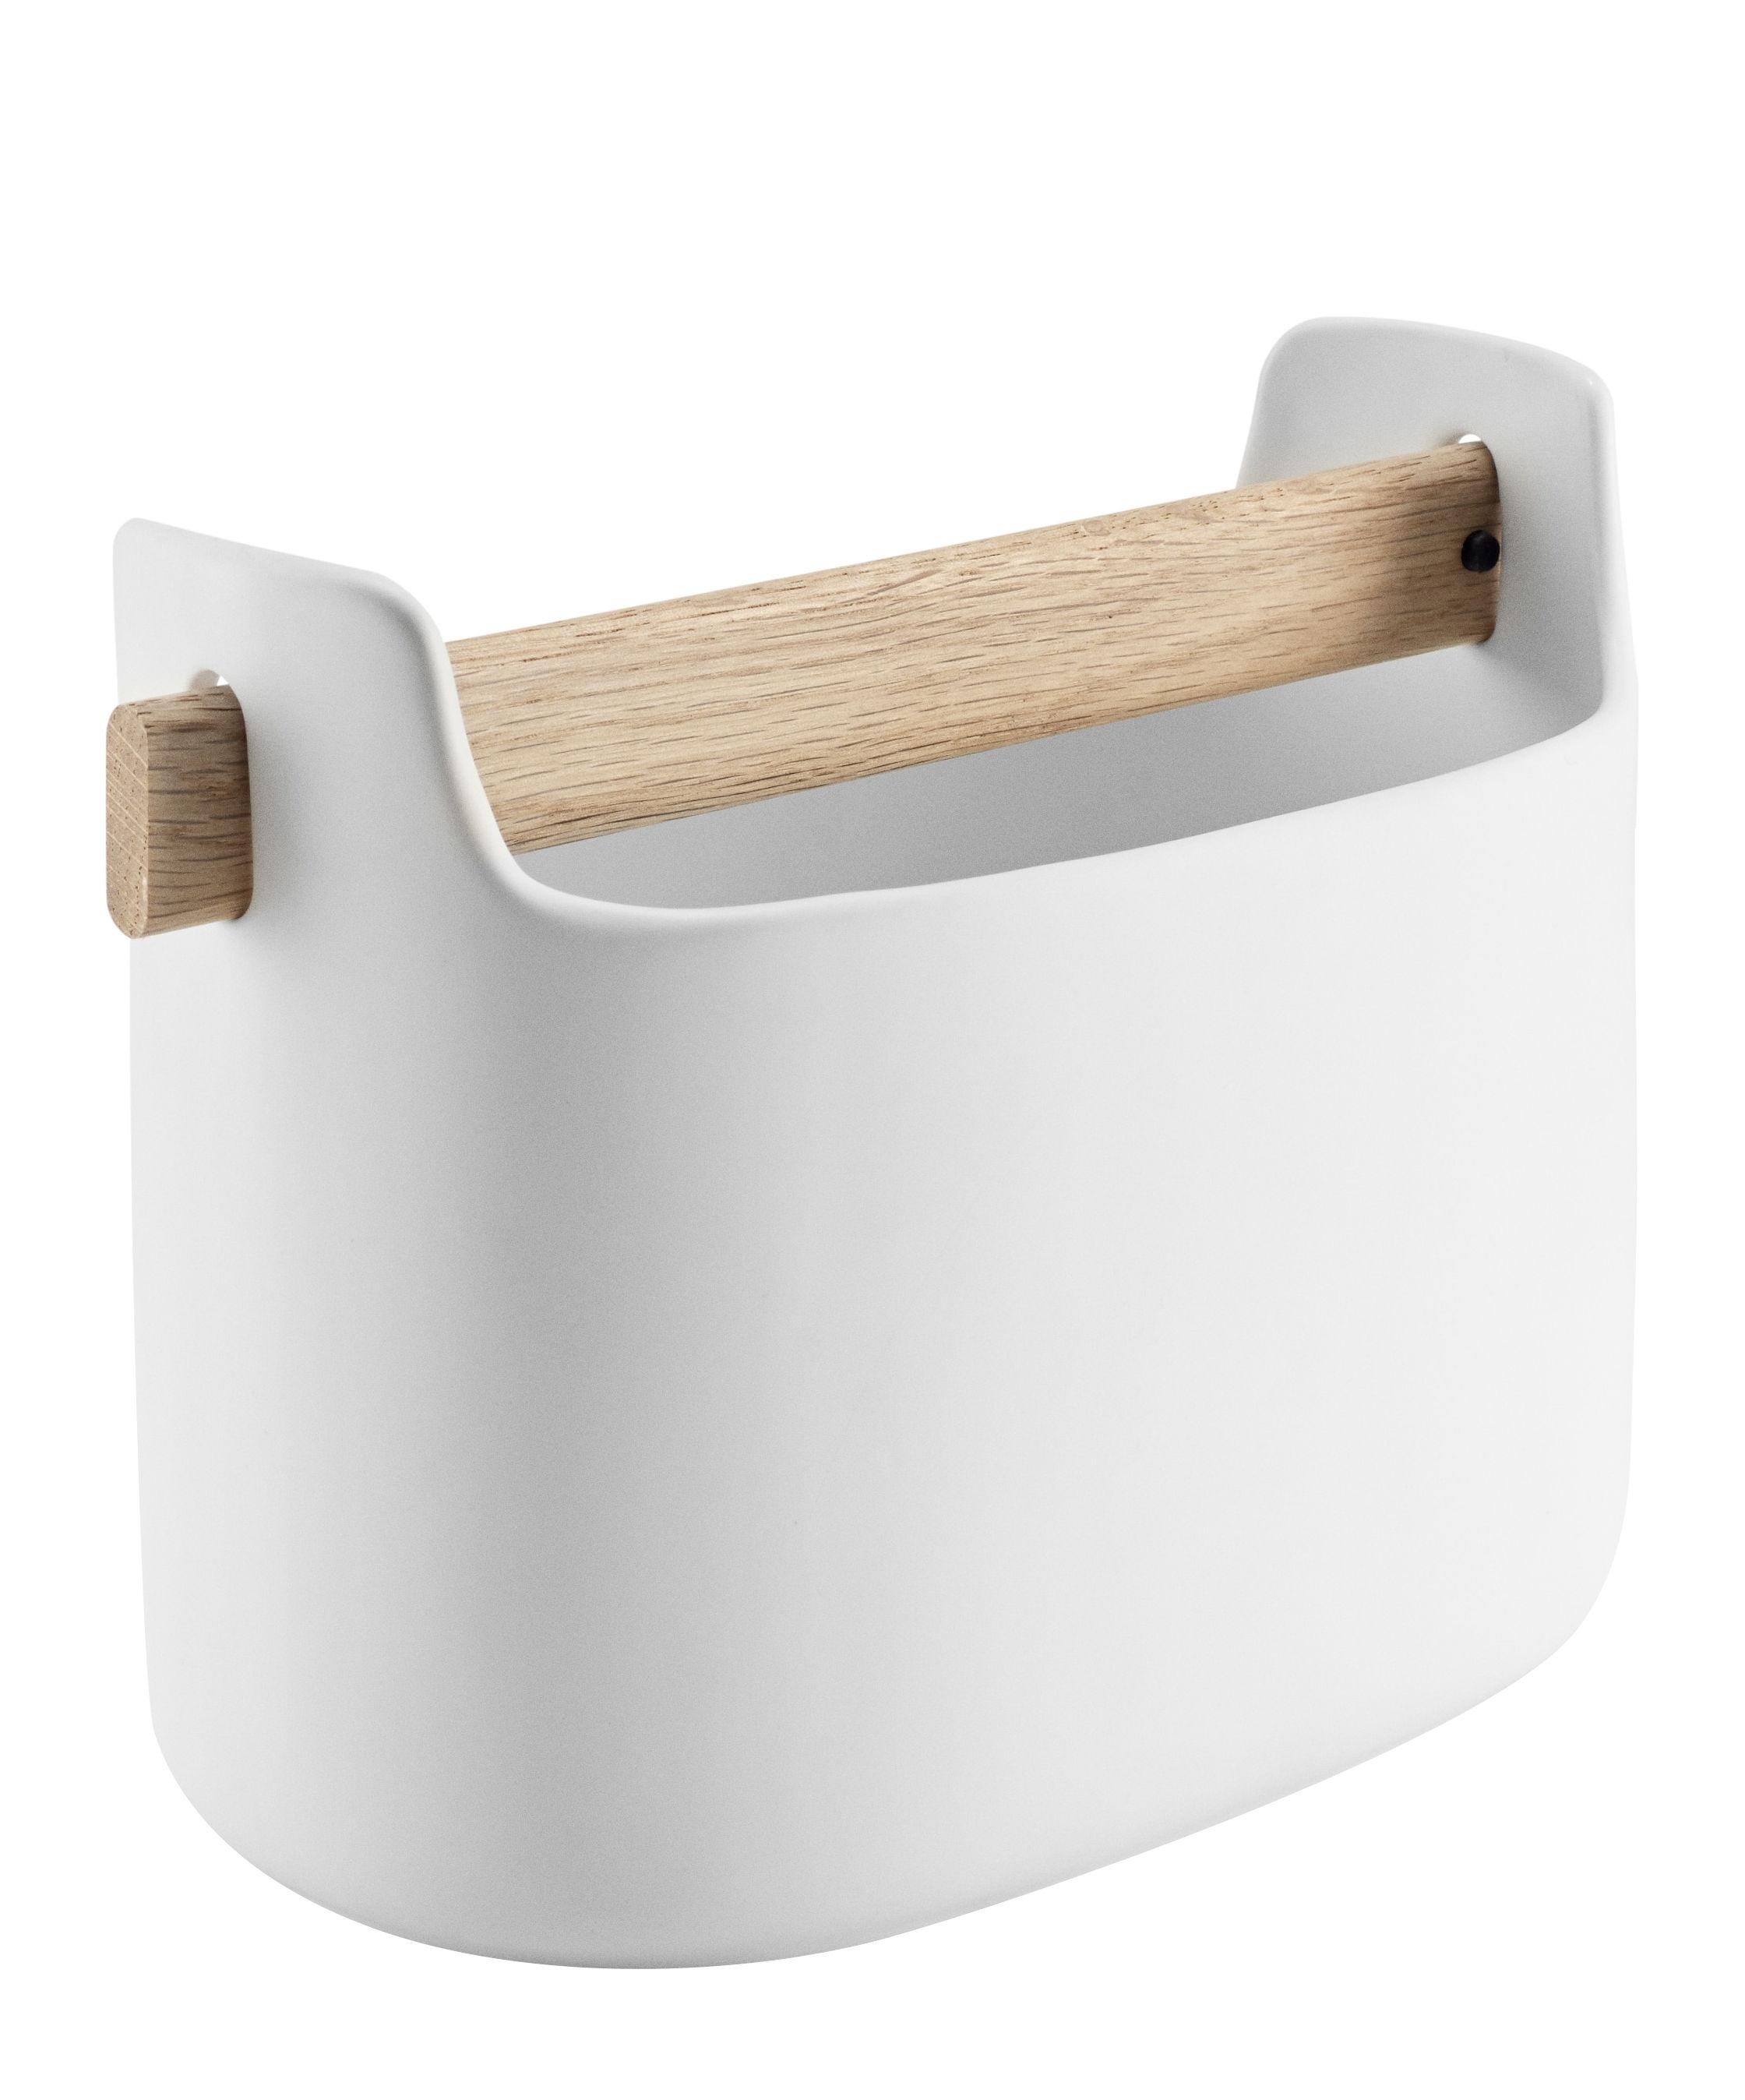 Accessories - Desk & Office Accessories - Storage box - / L 19 x H 15 cm - Ceramic & oak by Eva Solo - White / Oak - Ceramic, Oak